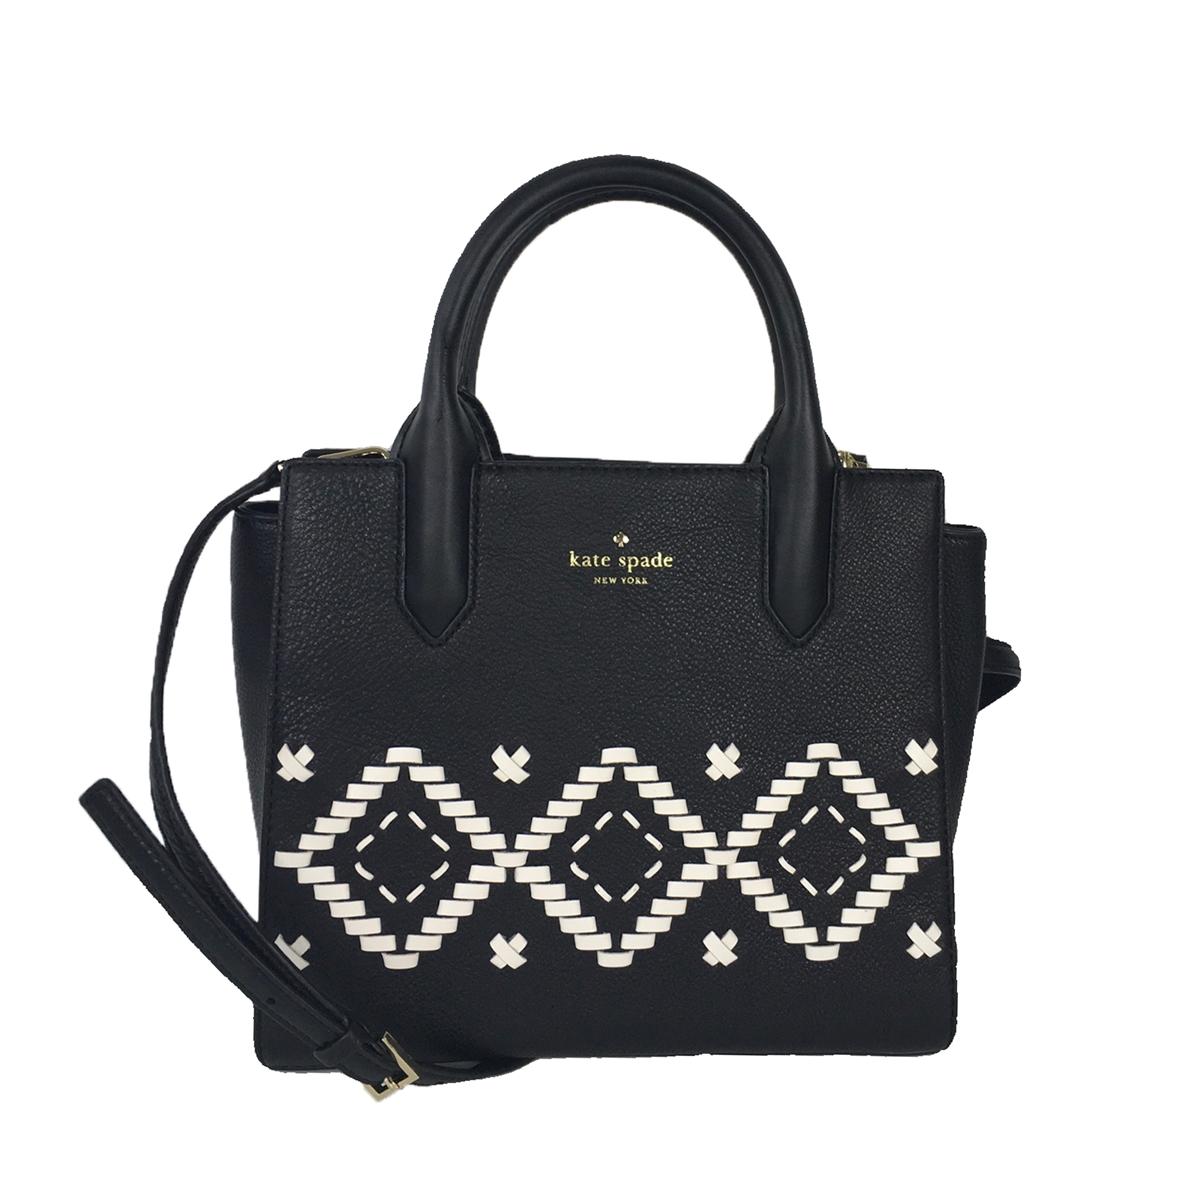 Kate Spade Flynn Street Small Meriwether Leather Satchel Black White